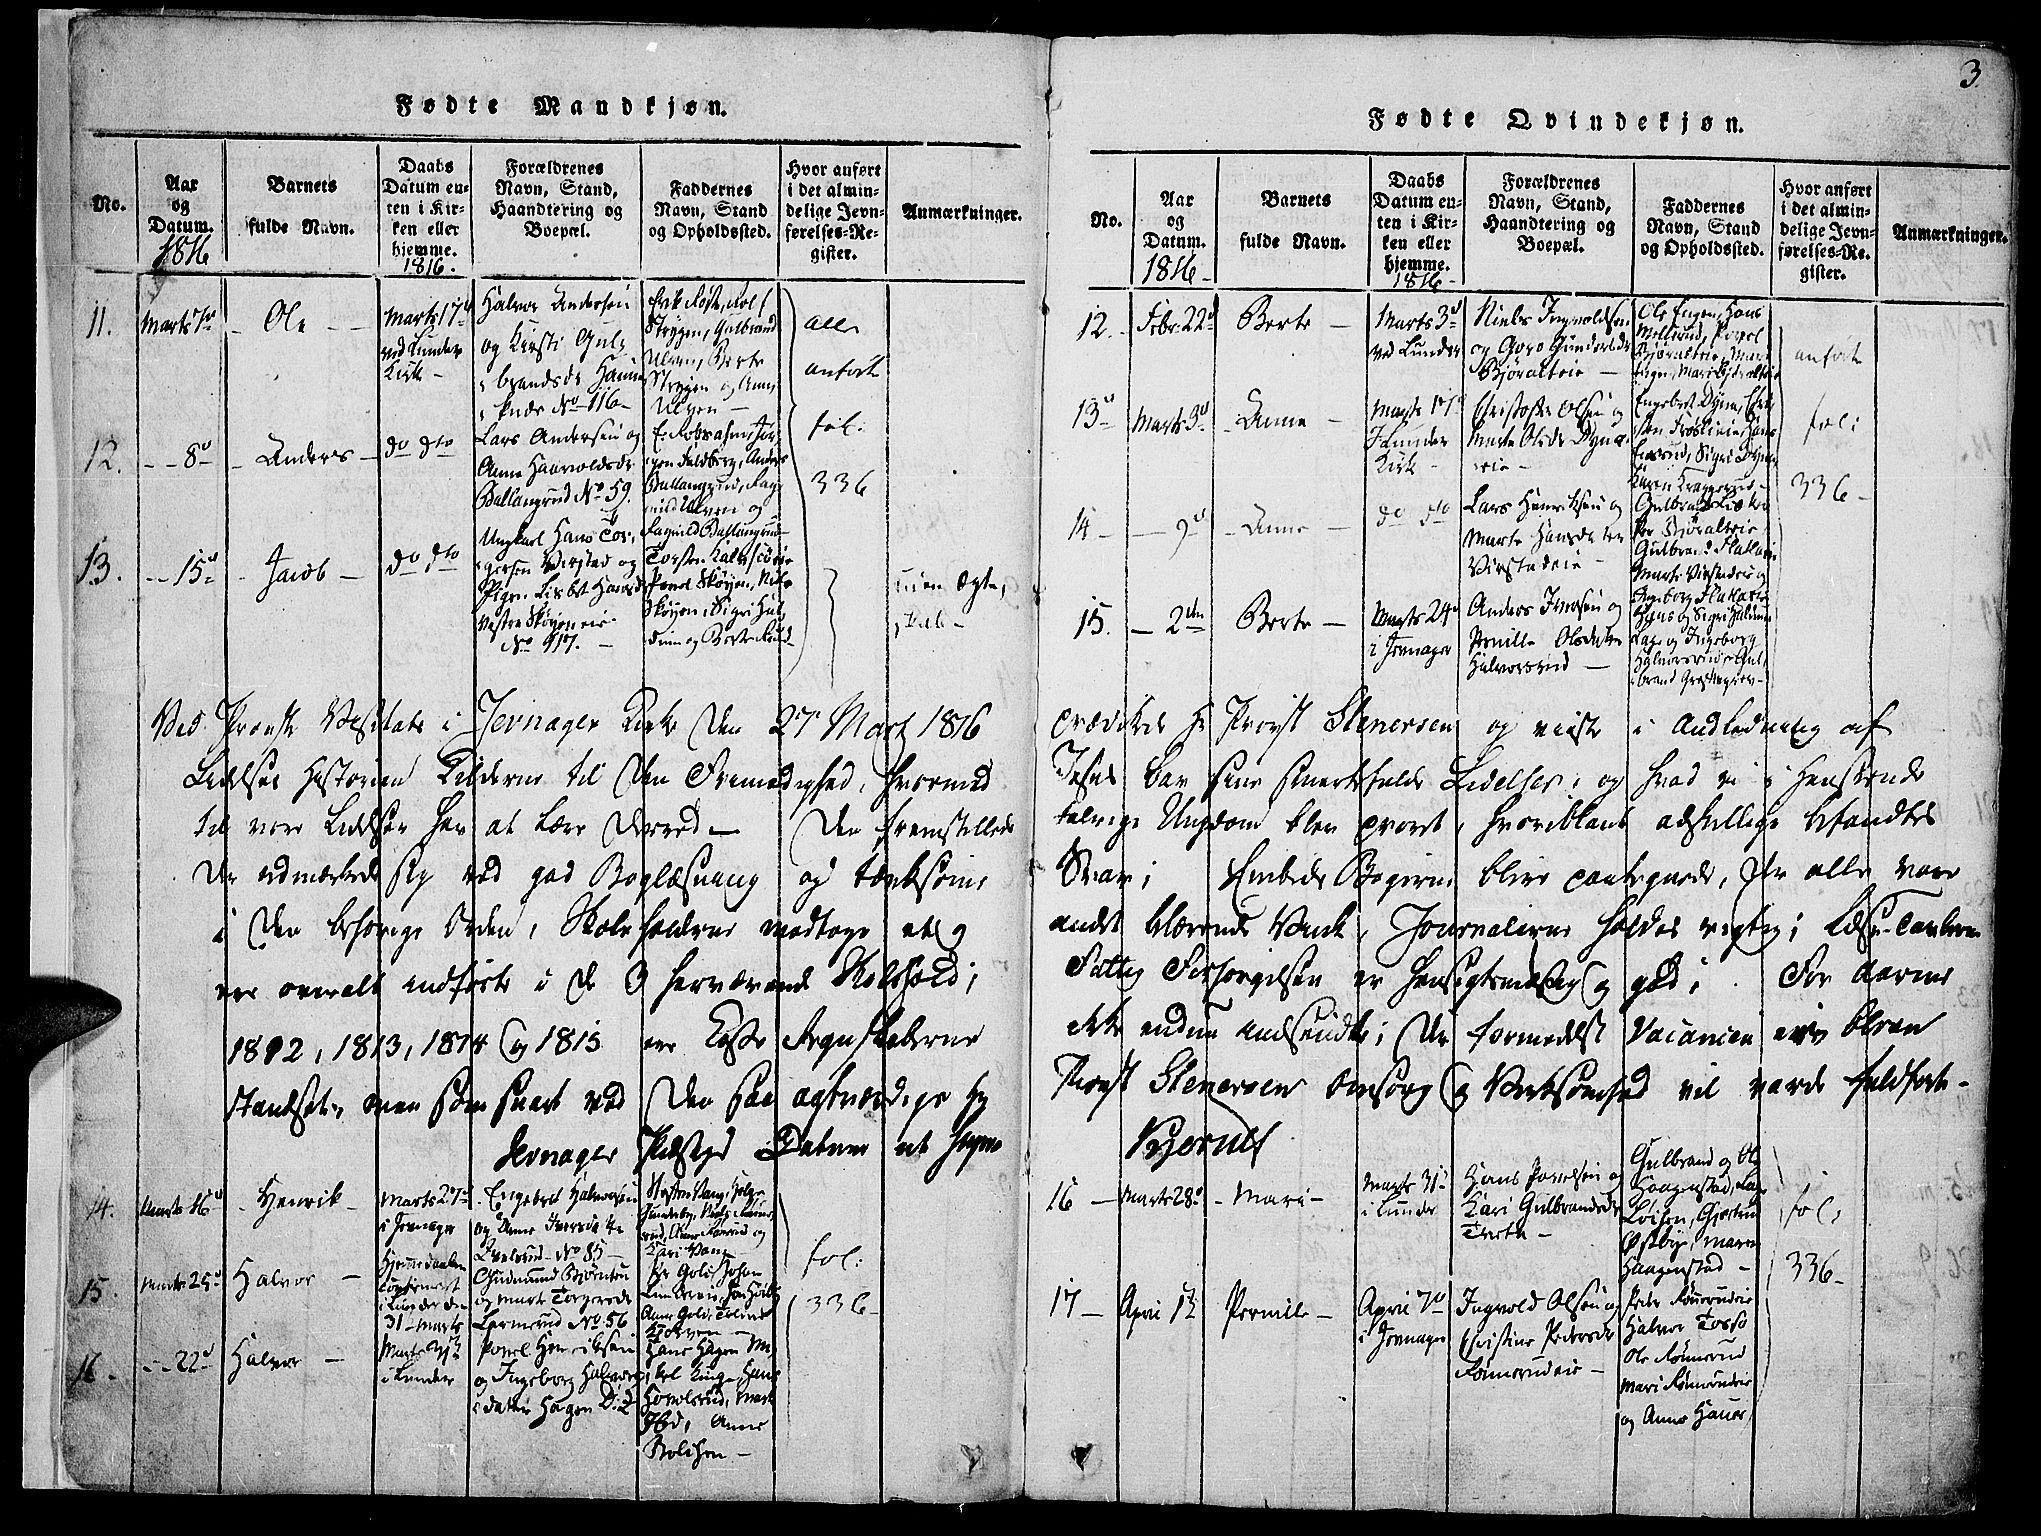 SAH, Jevnaker prestekontor, Ministerialbok nr. 5, 1815-1837, s. 3